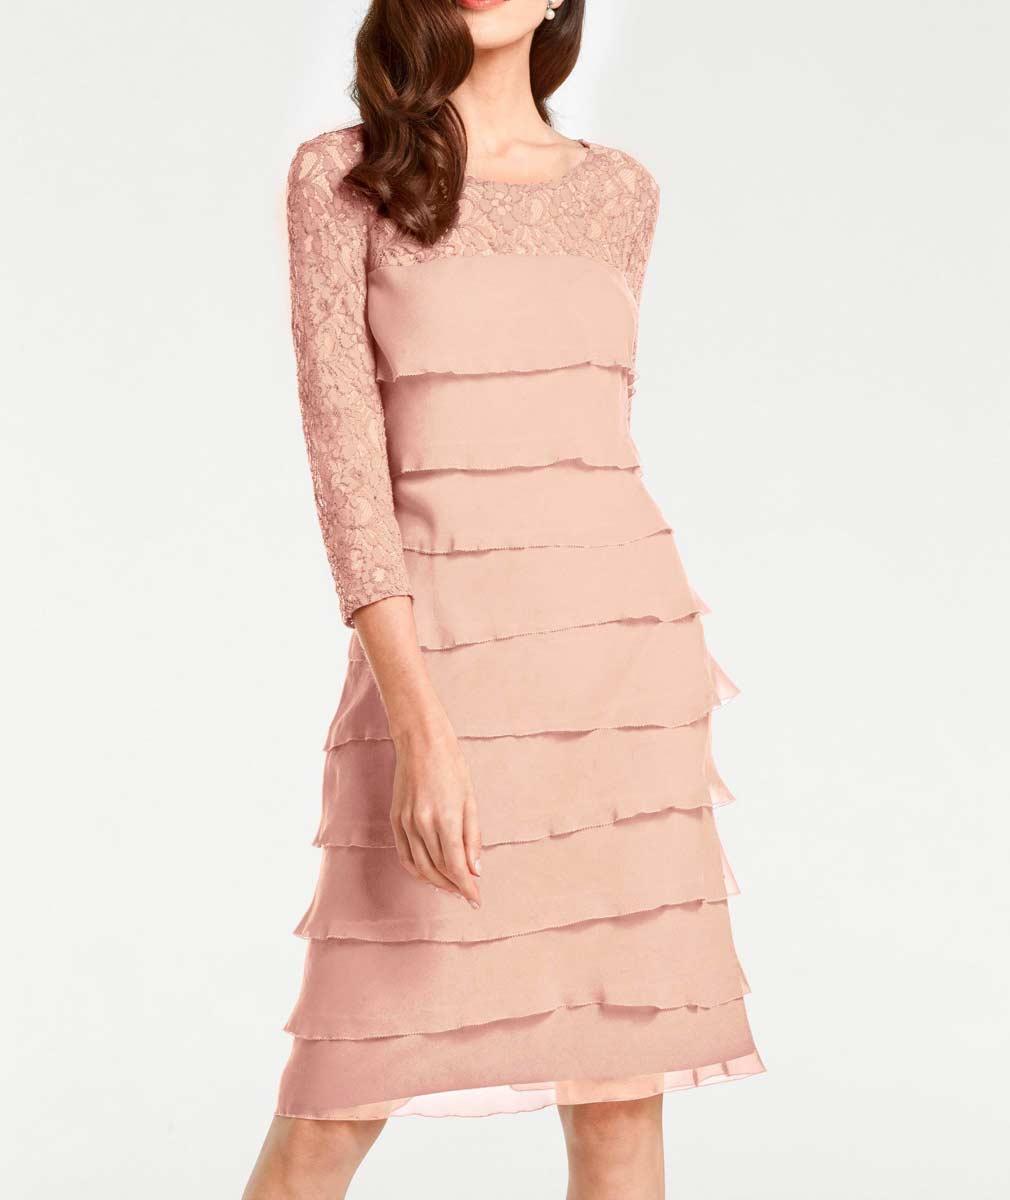 008.809 ASHLEY BROOKE Damen Designer-Spitzen-Chiffonkleid Rosé